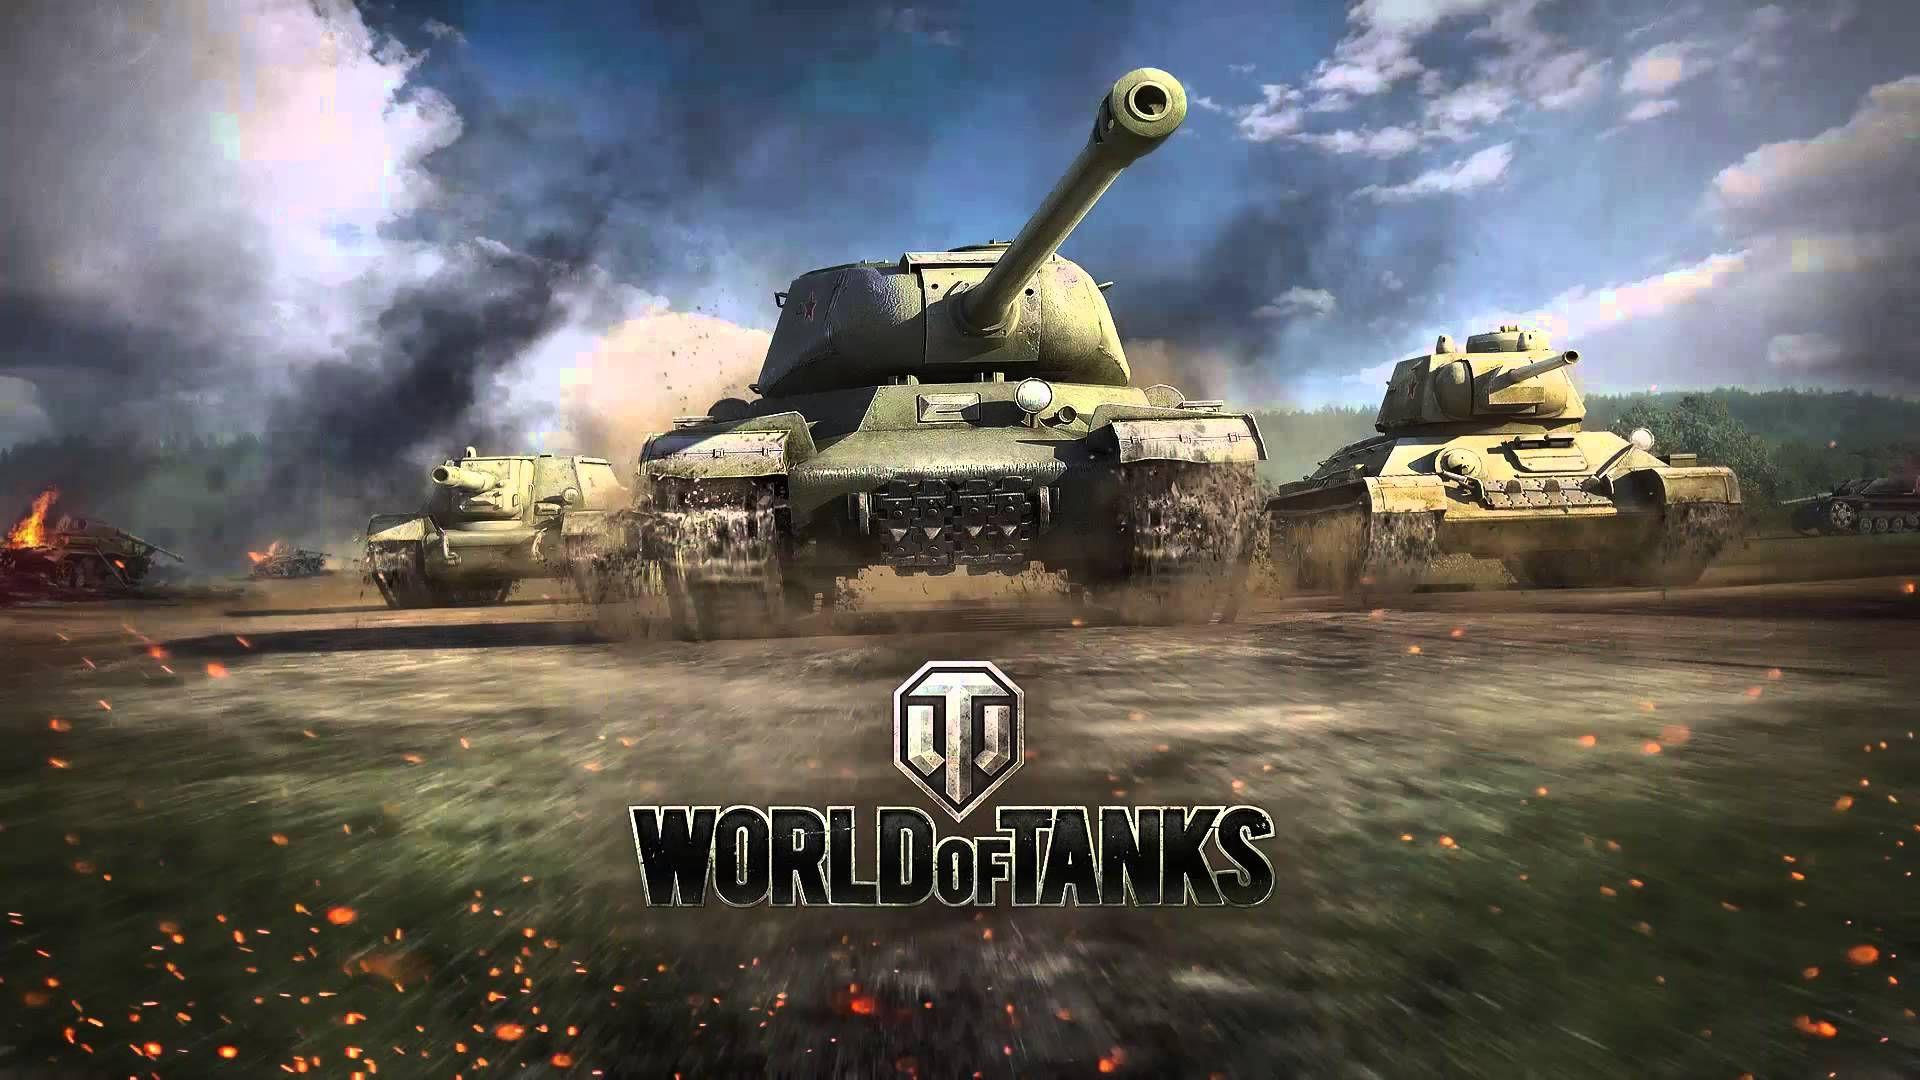 World Of Tanks 4k Xboxgames Games Ps4games Pcgames 4k Tank Iphonexwallpaper World Of Tanks Dark Wallpaper Tank Wallpaper